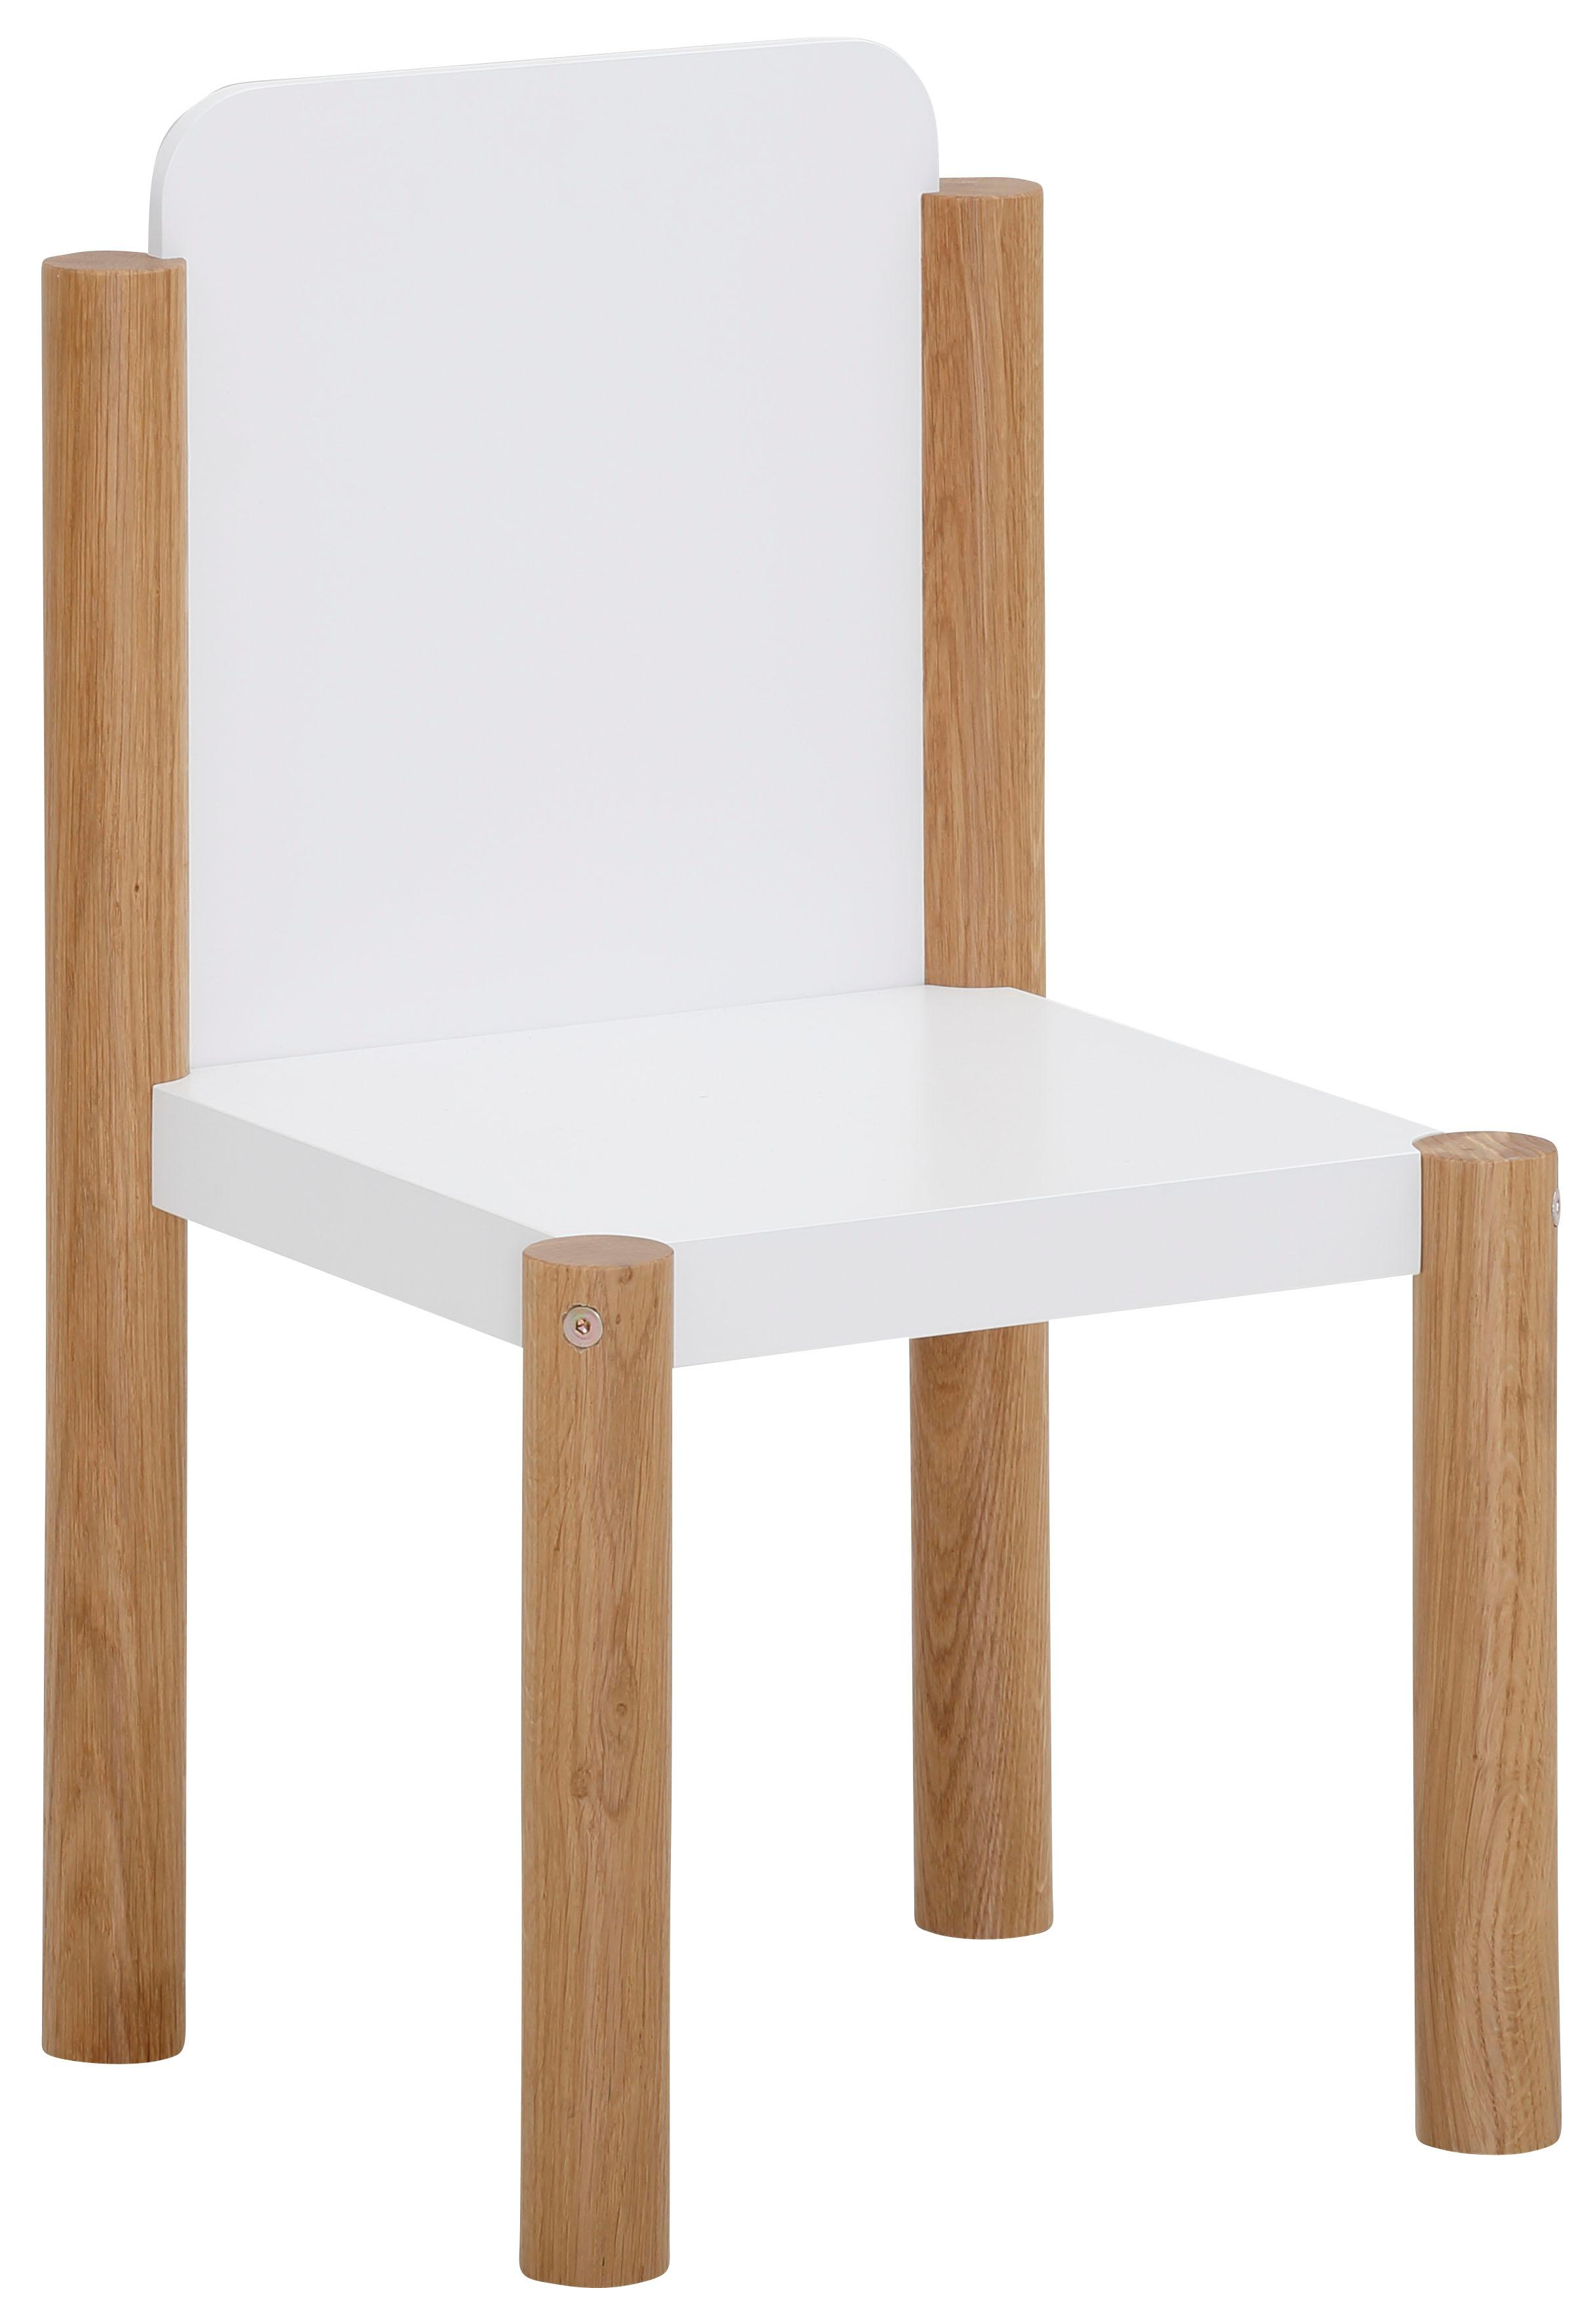 "Lüttenhütt Stuhl ""Hannover"" Wohnen/Möbel/Stühle & Sitzbänke/Holzstühle"